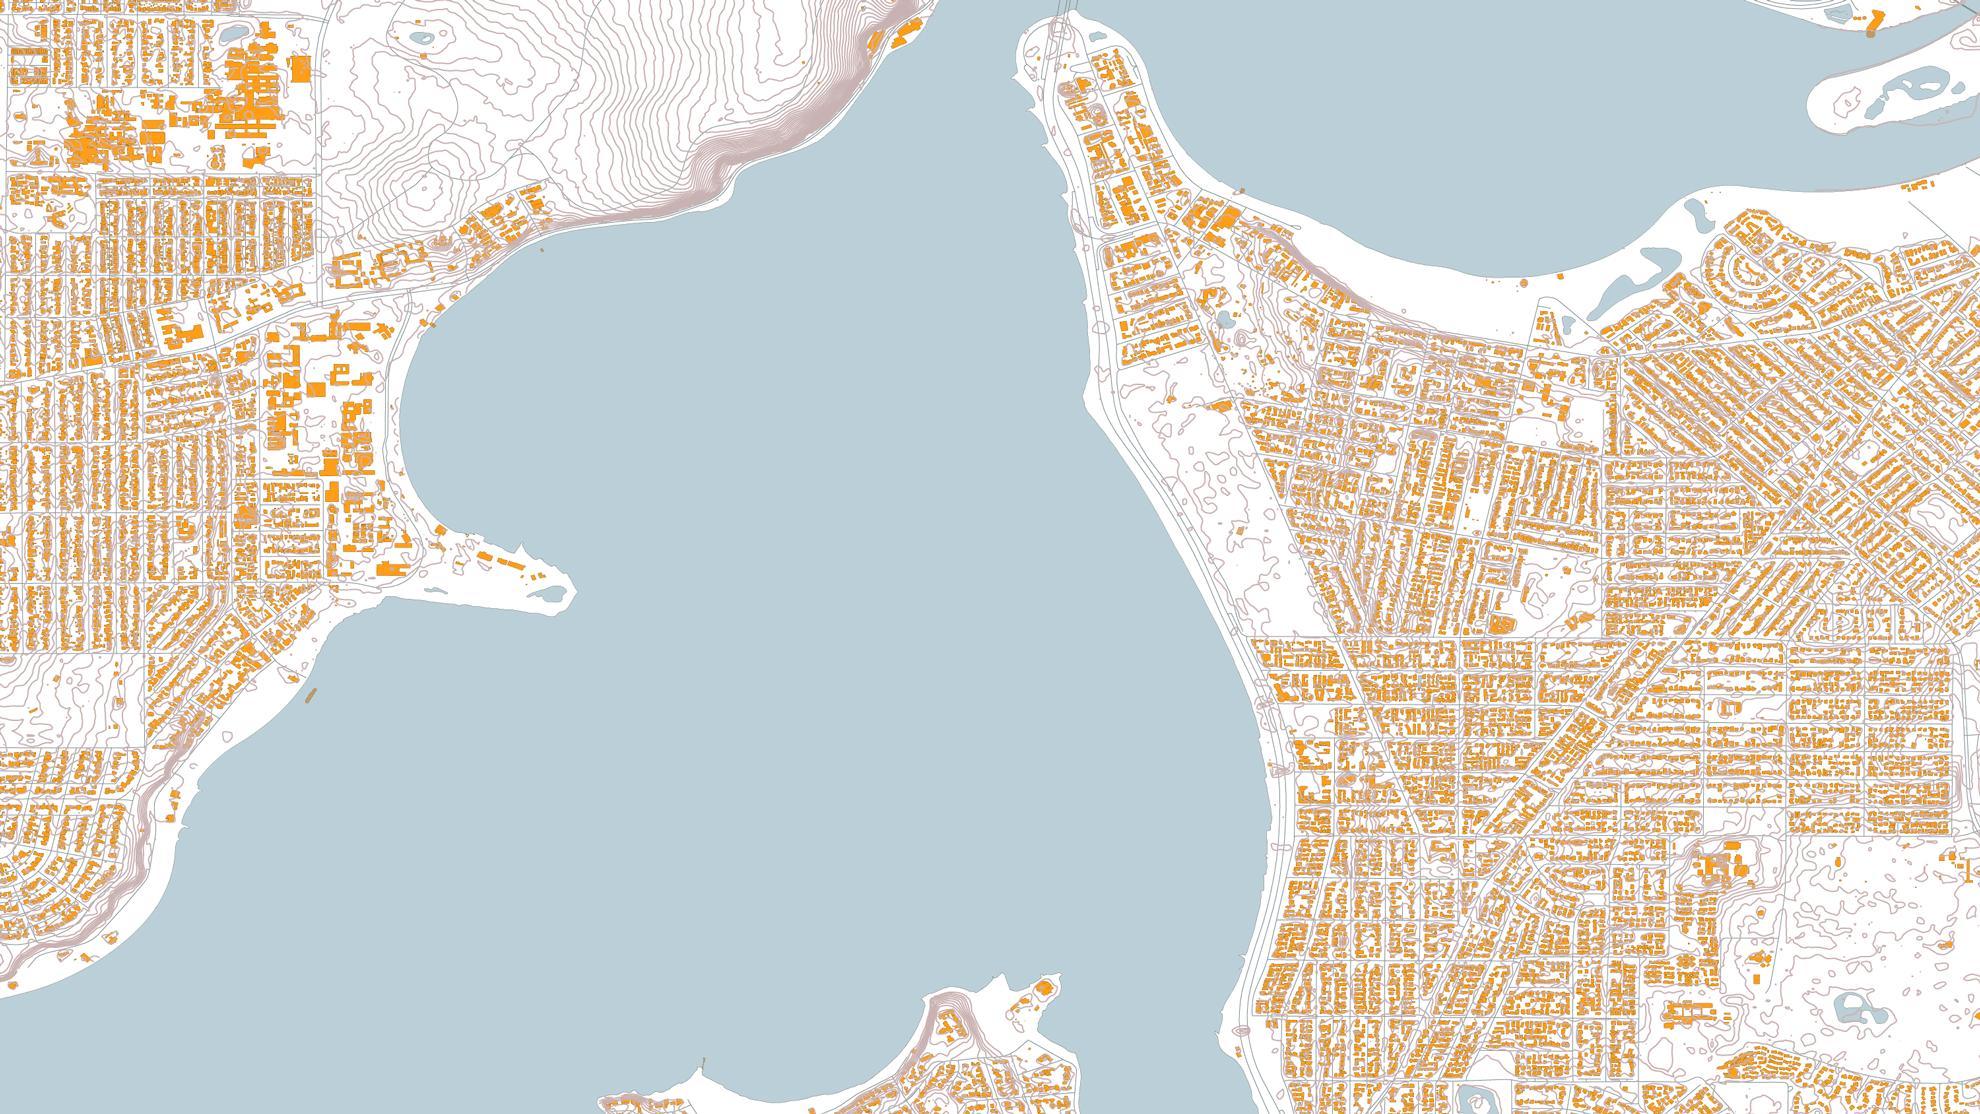 [Figure: Snapshot of GIS data]